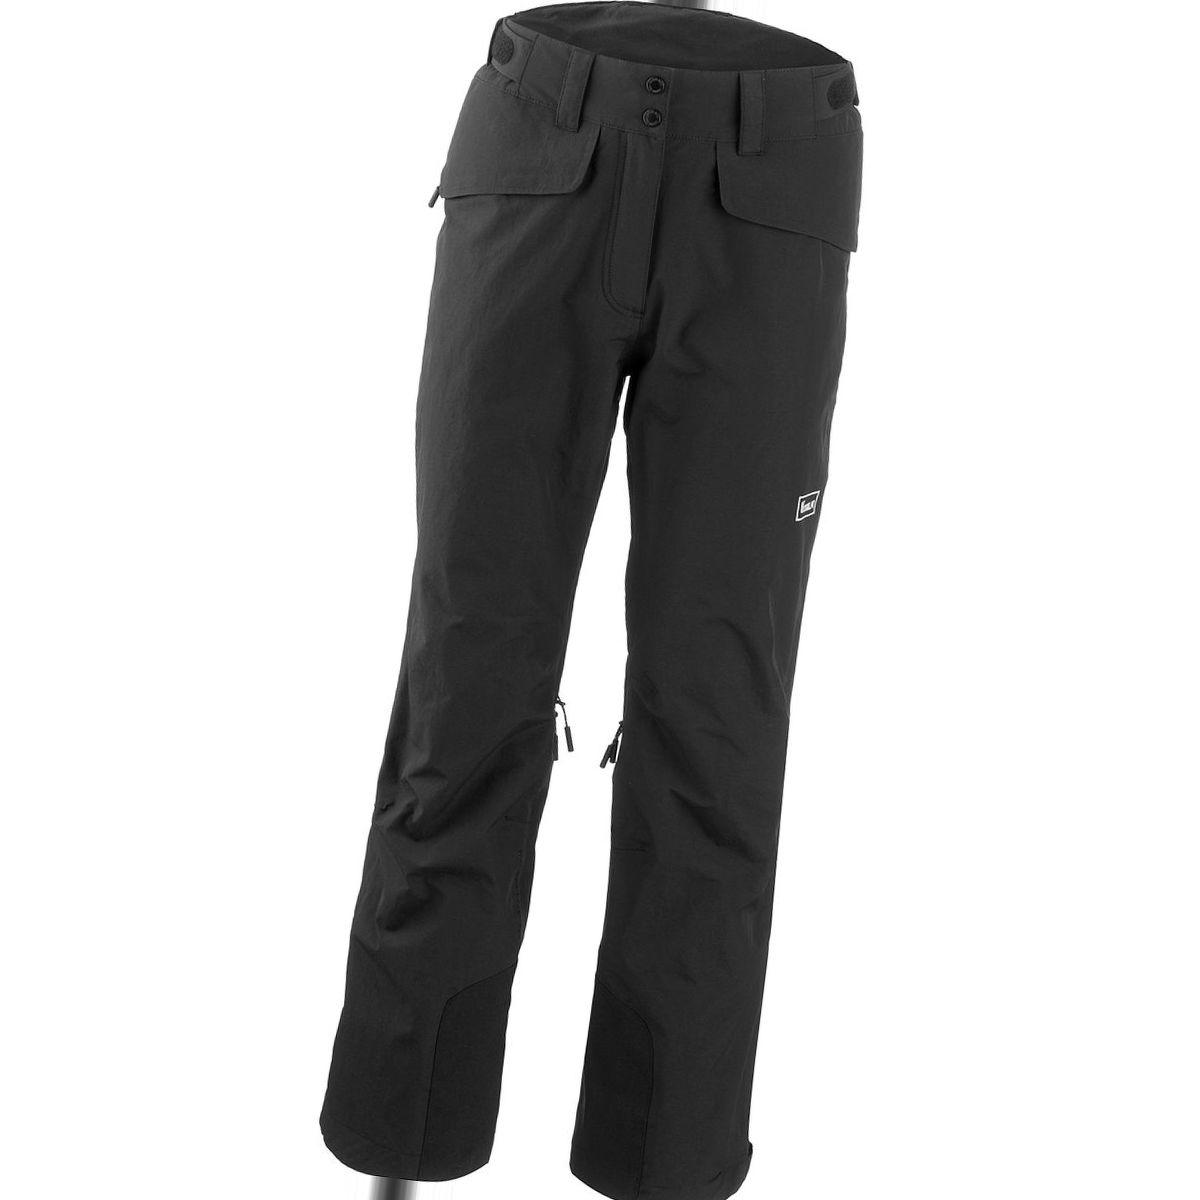 Planks Clothing Tracker Pant - Men's